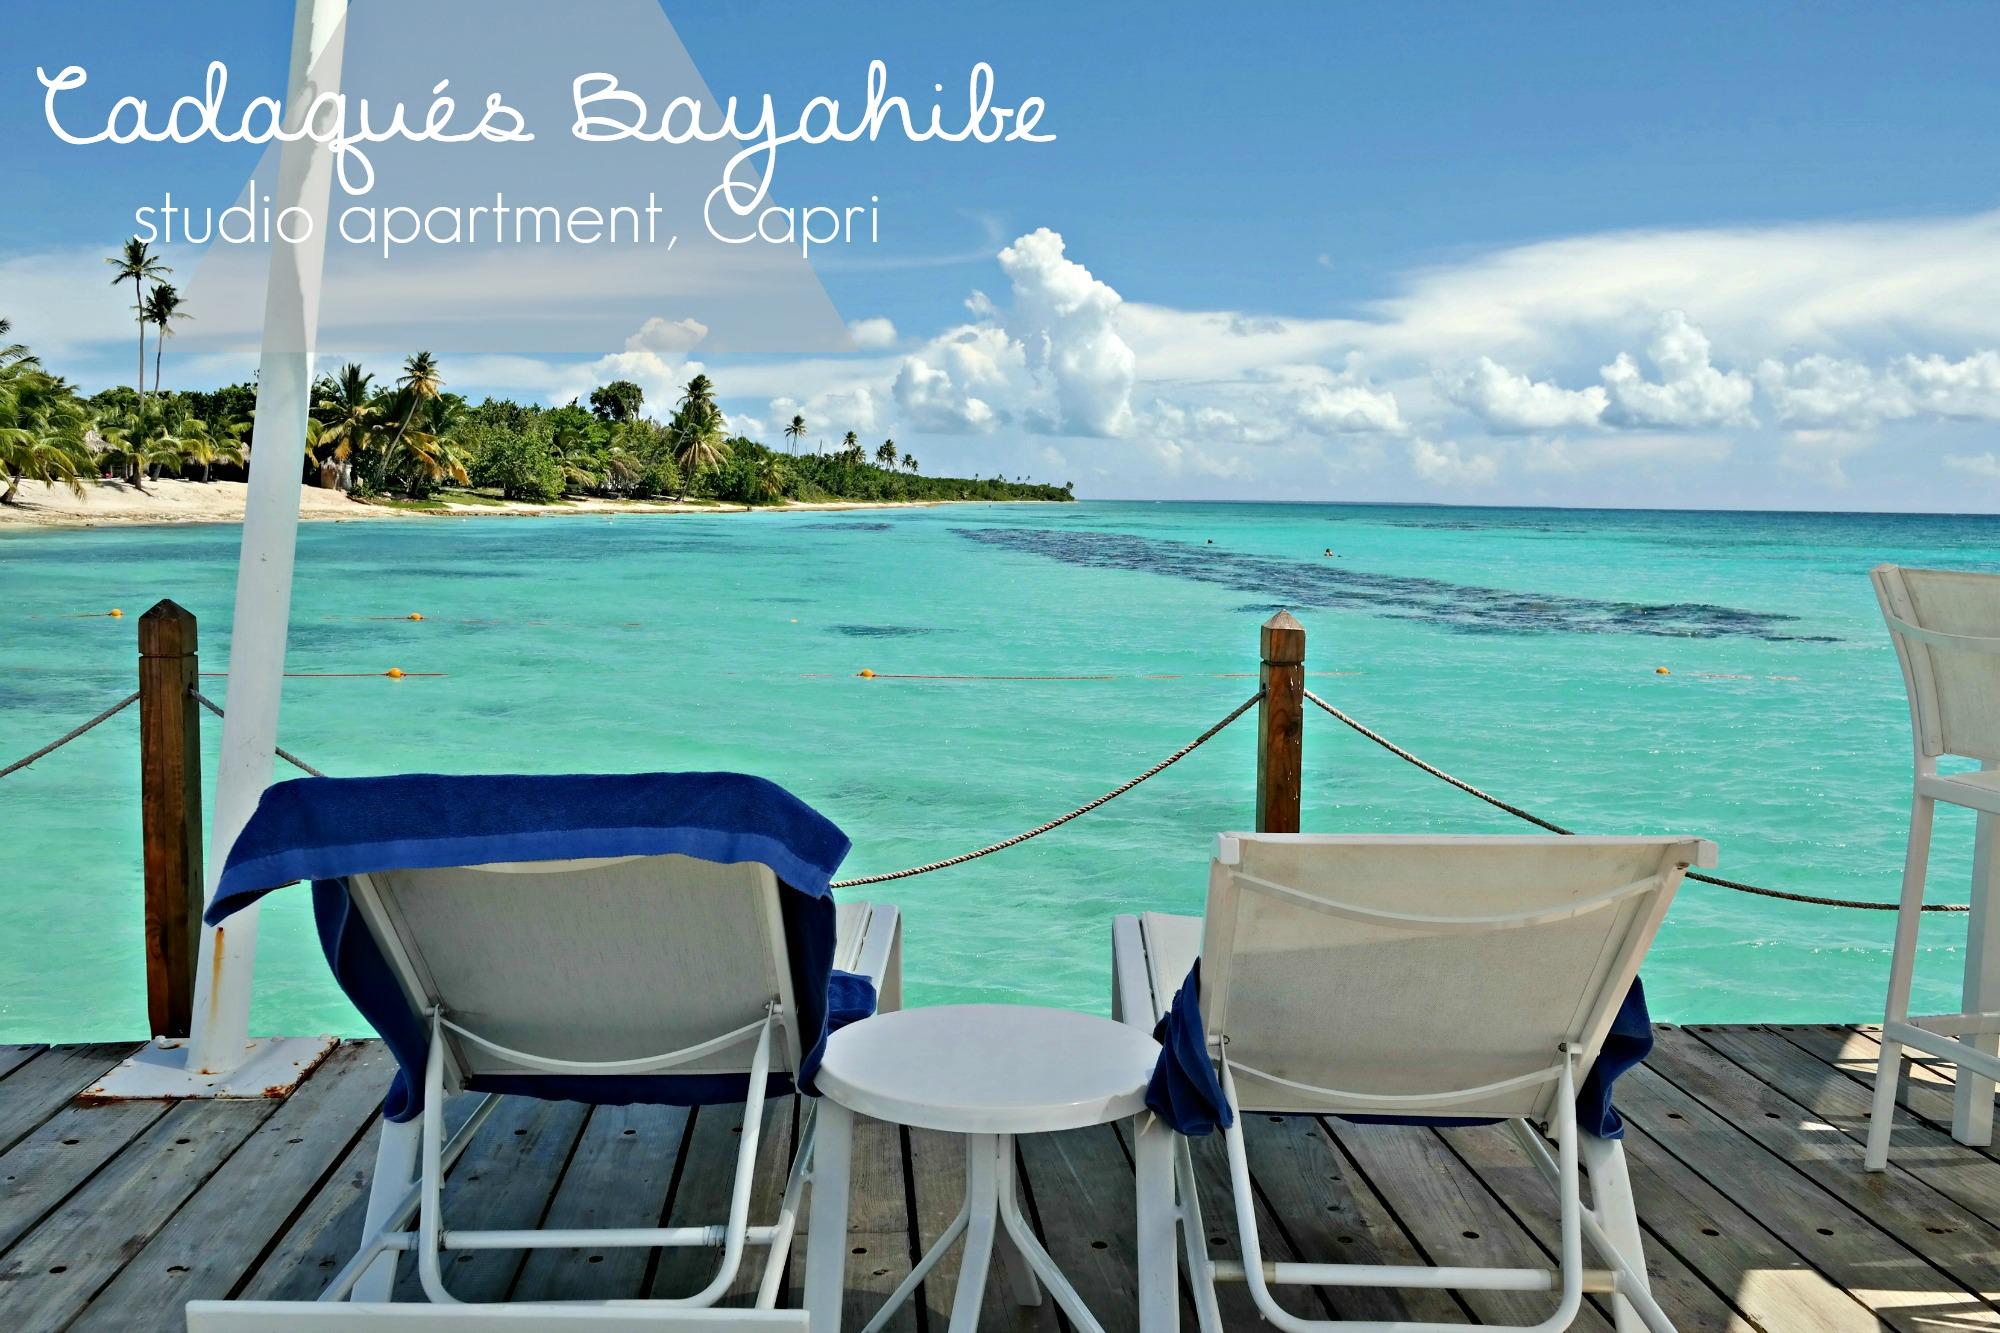 Dominican Republic Resorts Cadaques Bayahibe